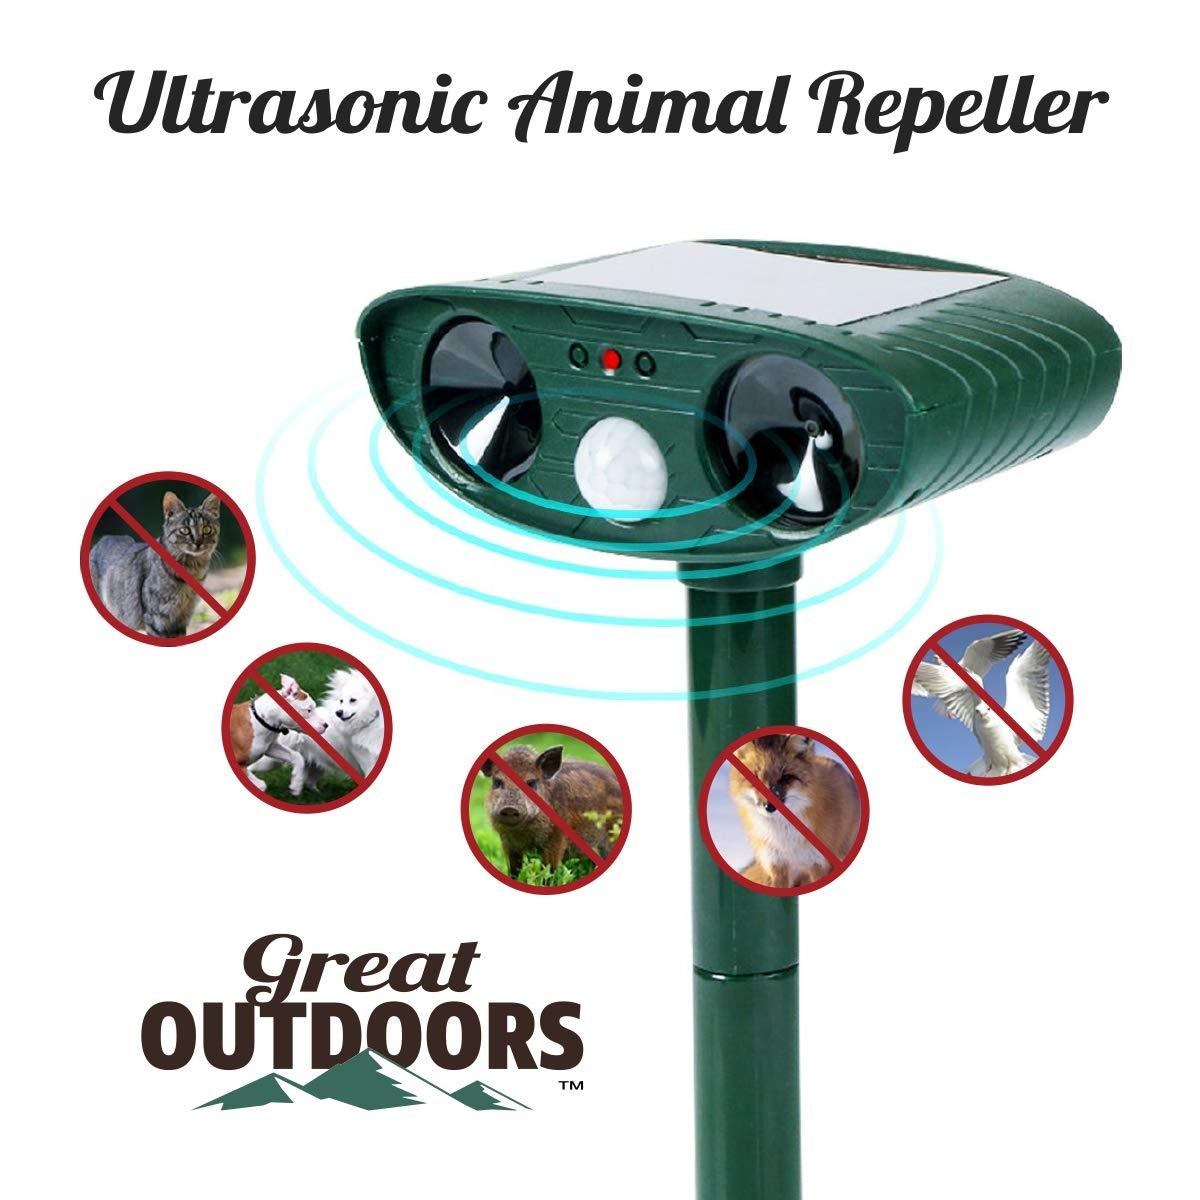 Great Outdoors Ultrasonic Animal Repeller